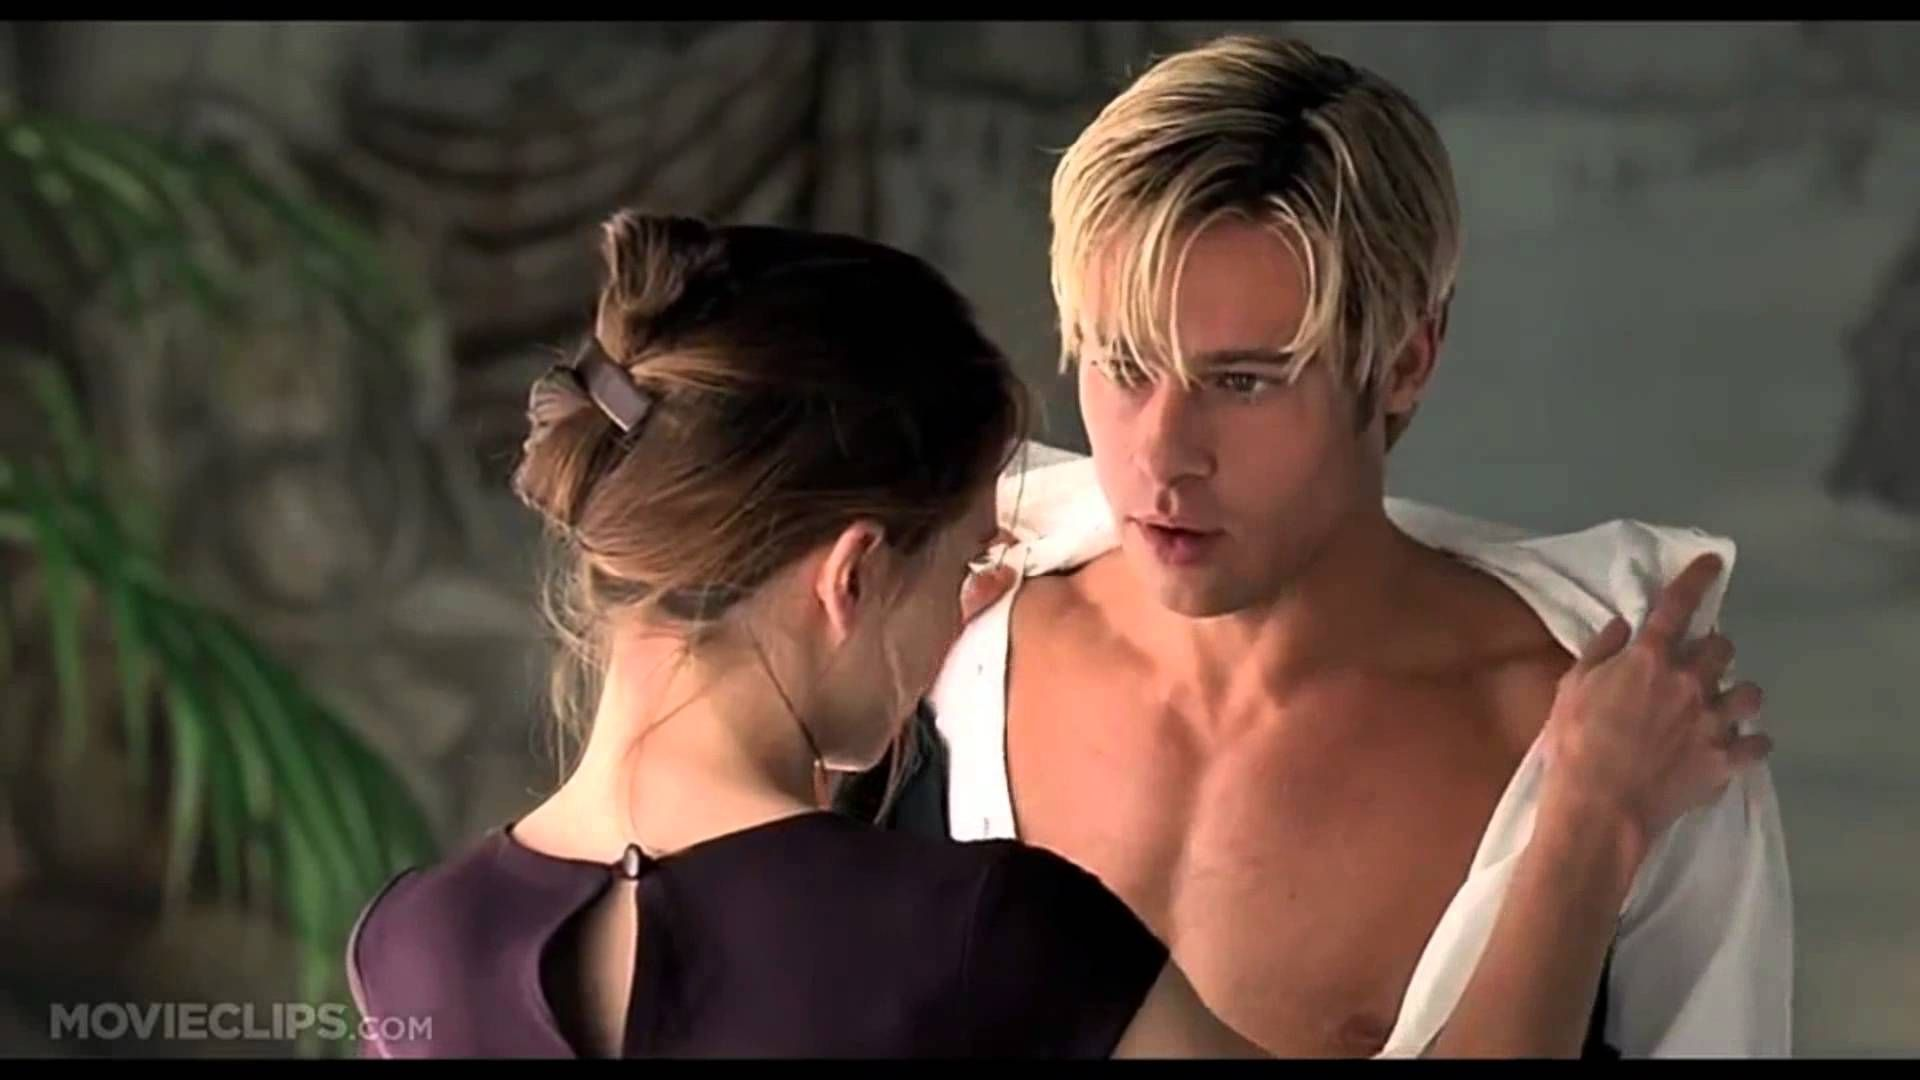 Claire Forlani Meet Joe Black 1998 1920 1080 Brad Pitt Young Brad Pitt Brad Pitt Shirtless